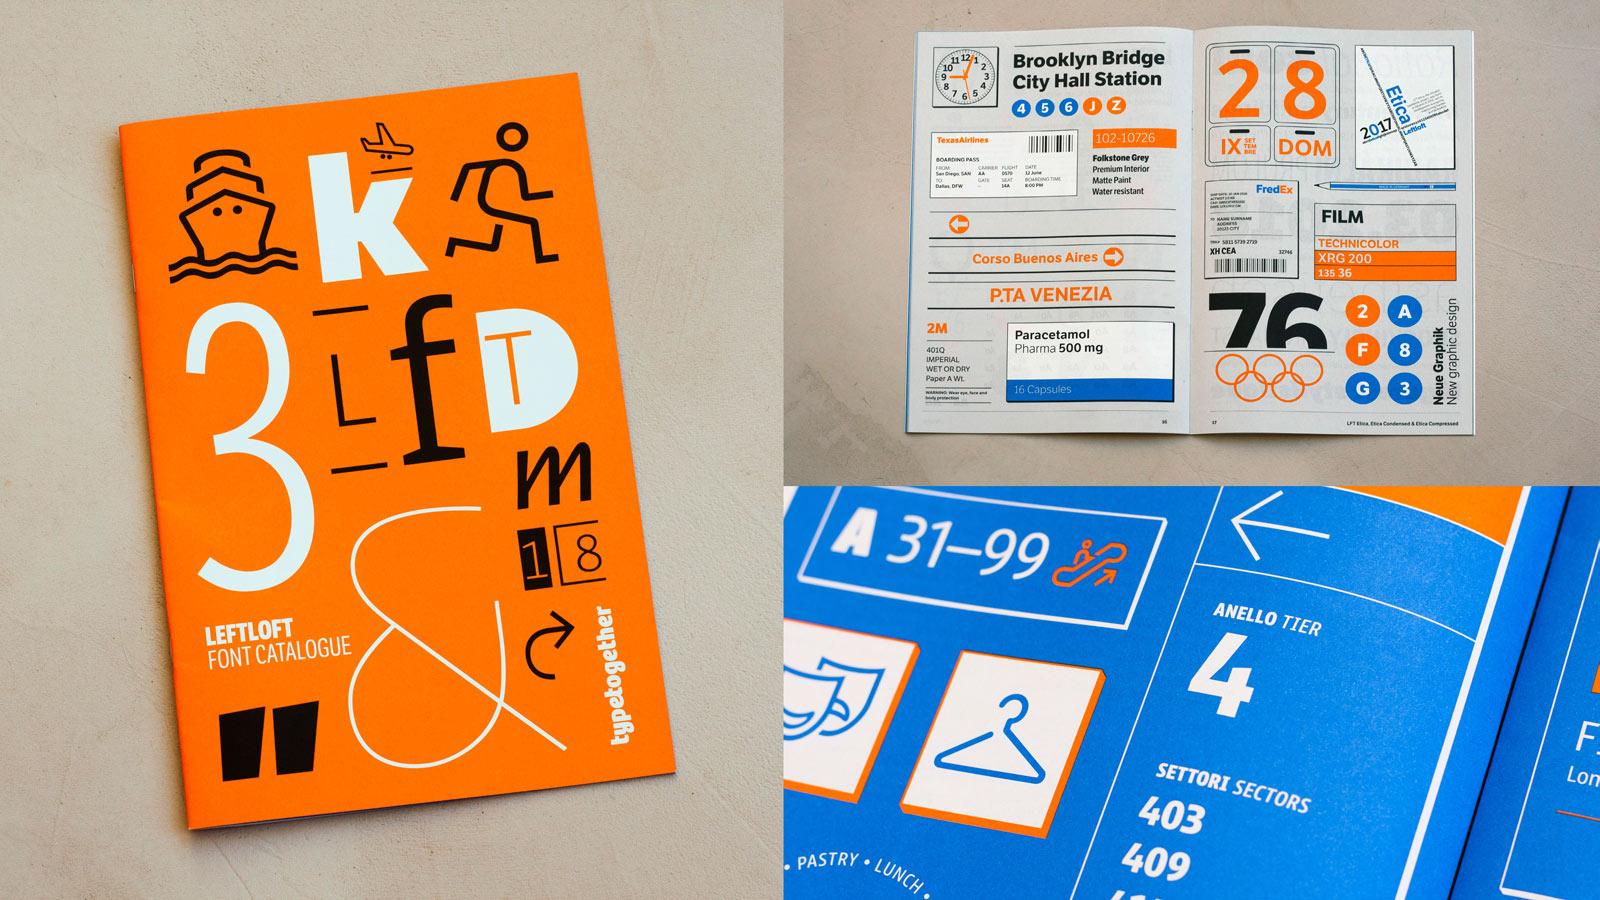 Leftloft font catalogue